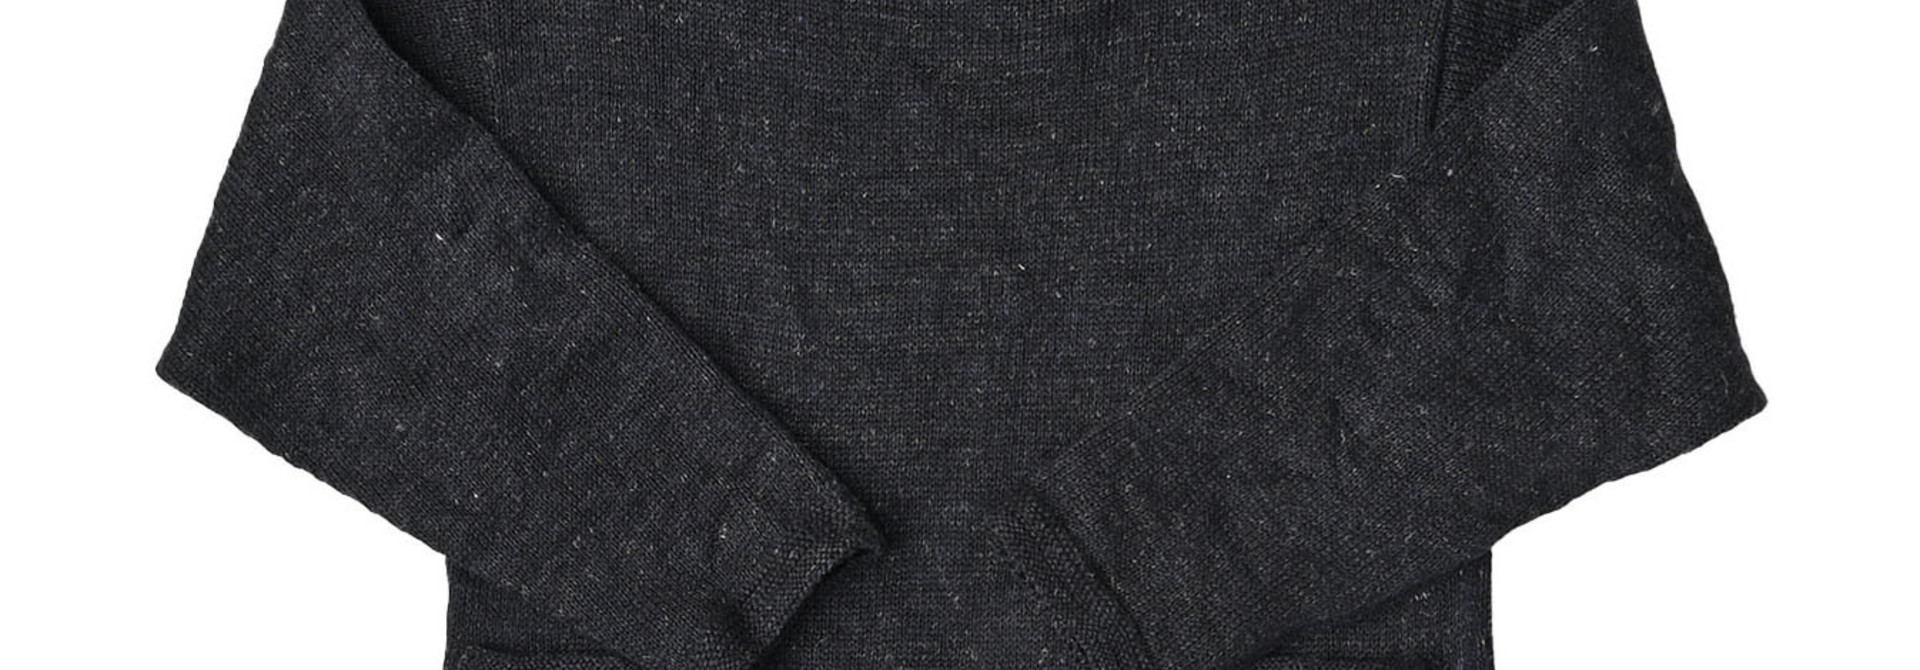 WH Linen Tweed Knit-sew 908 Umahiko Sweater (0321)